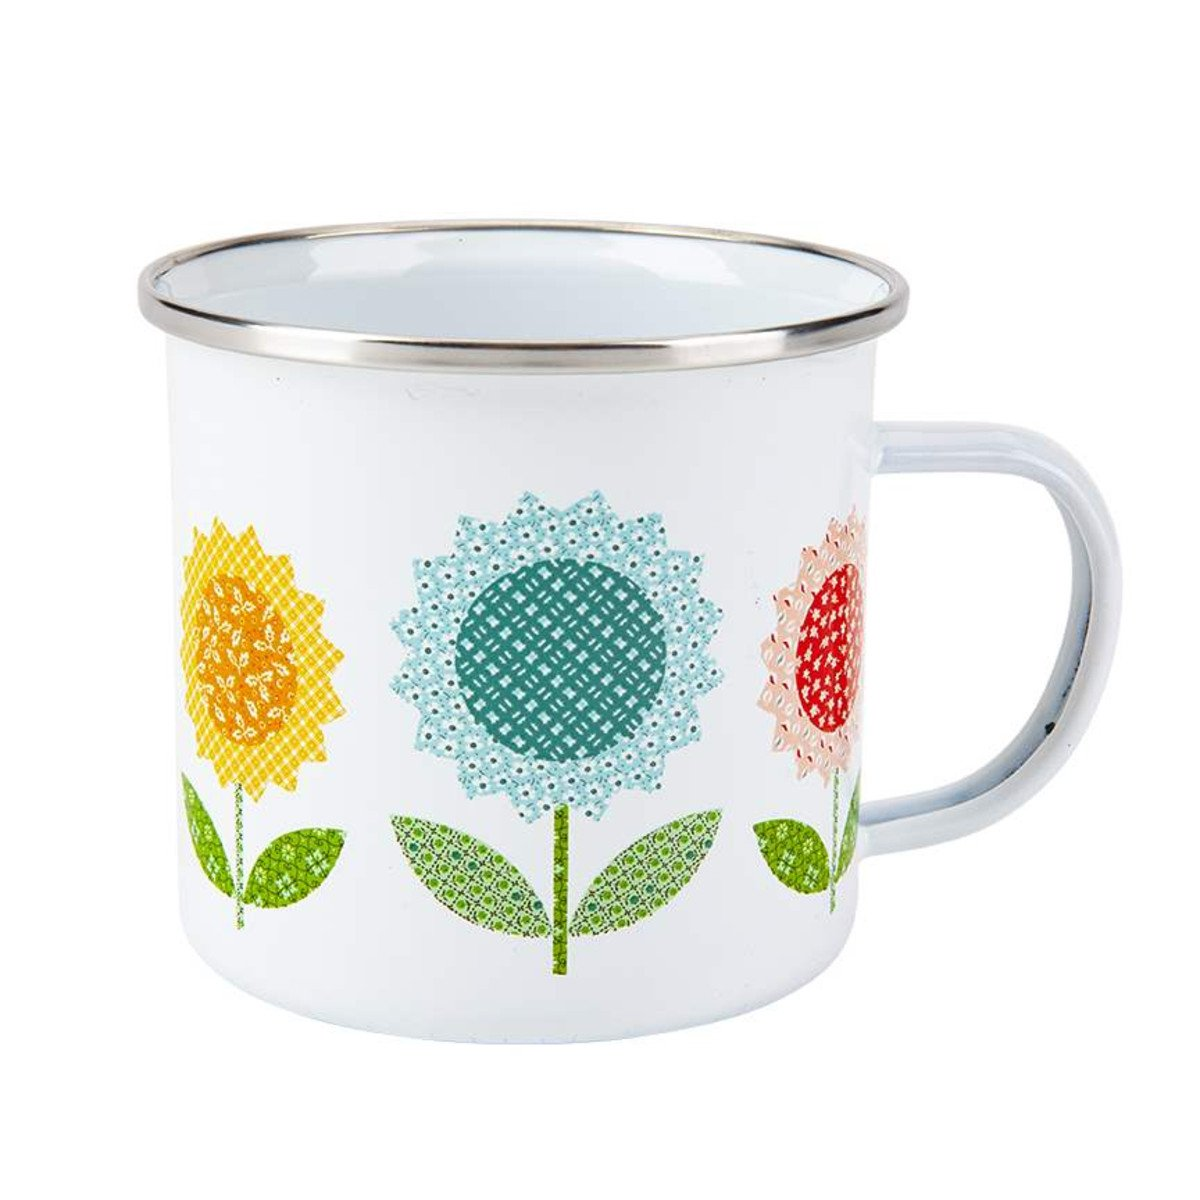 Flea Market Tin Mug